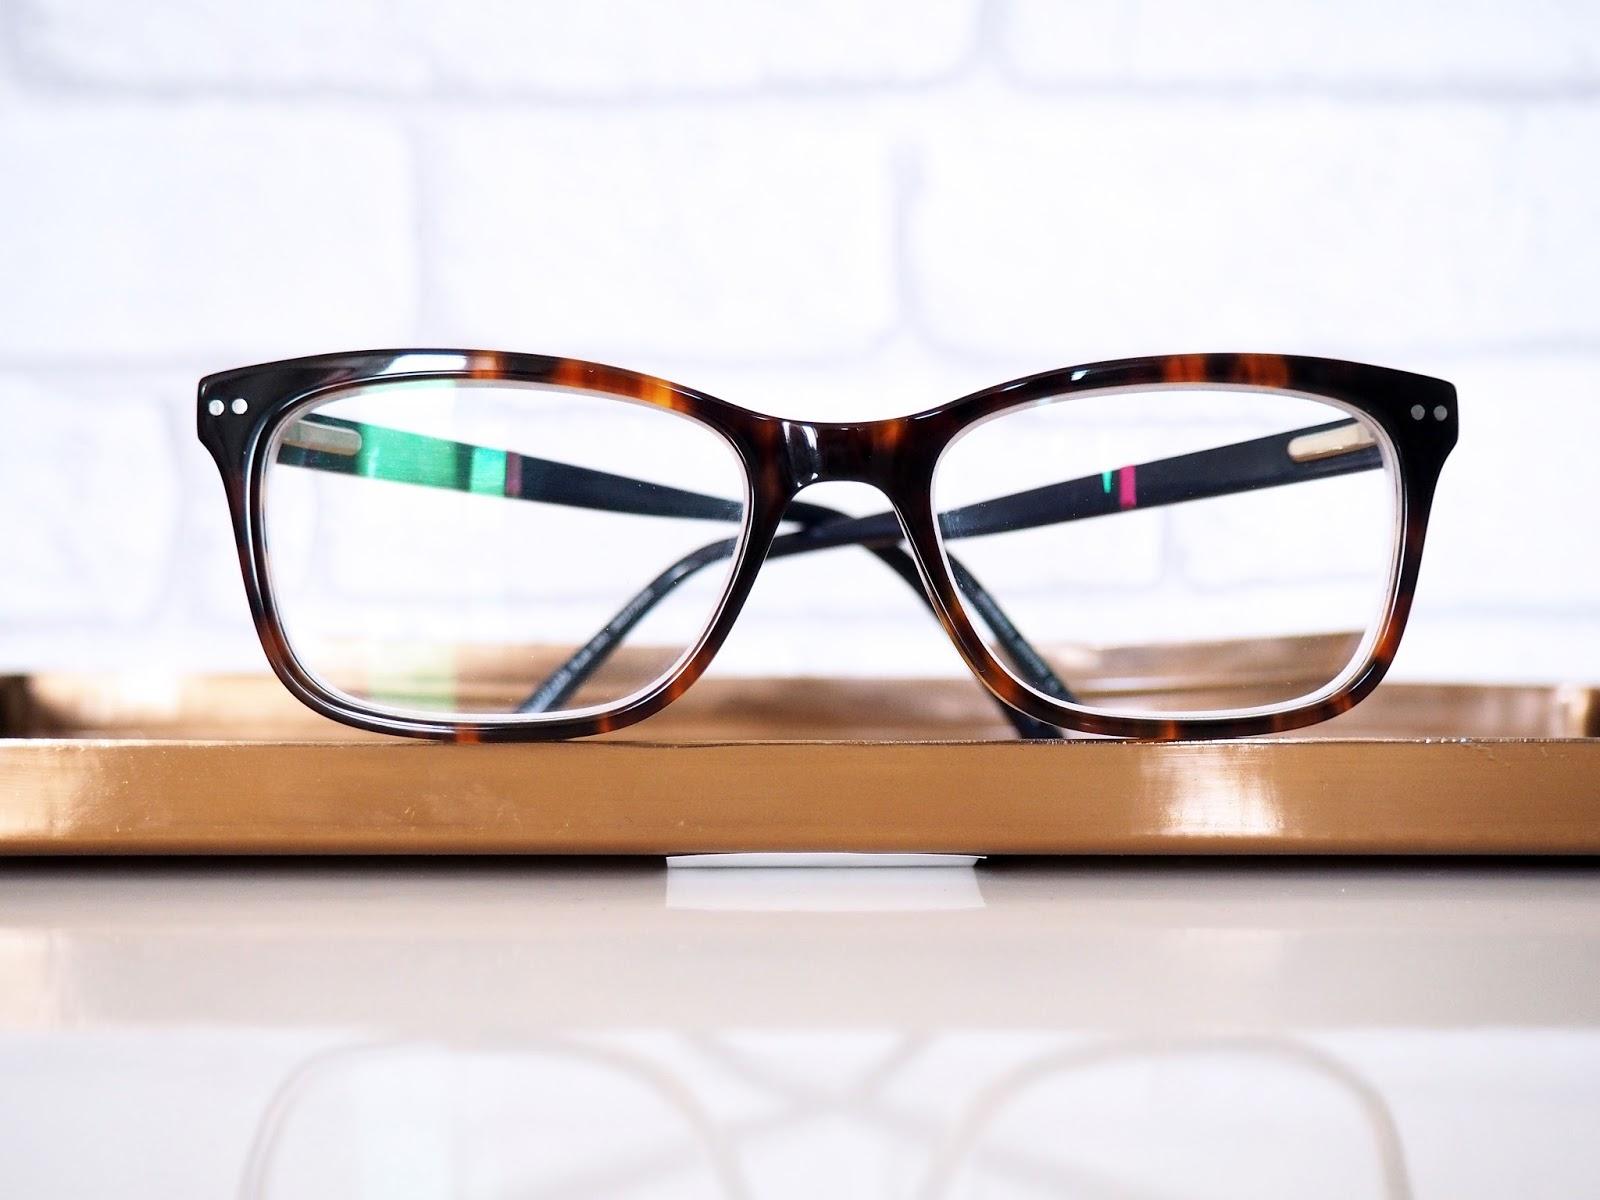 72a98e71cfc1 Specsavers Glasses - Reinventing Neesha